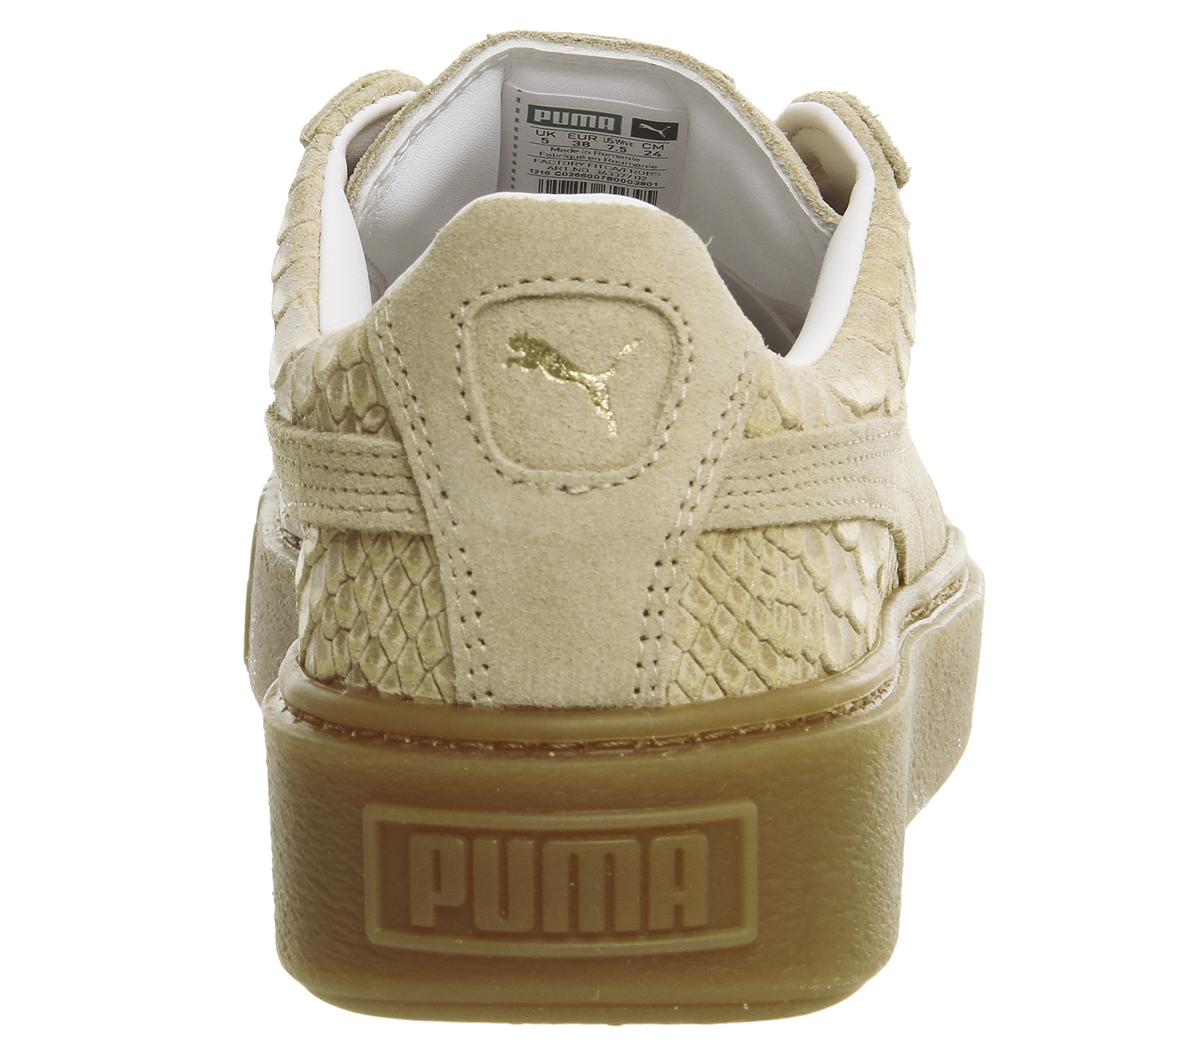 Sentinel Womens Puma Suede Platform NATURAL EXOTICS Trainers Shoes a4ea74c73